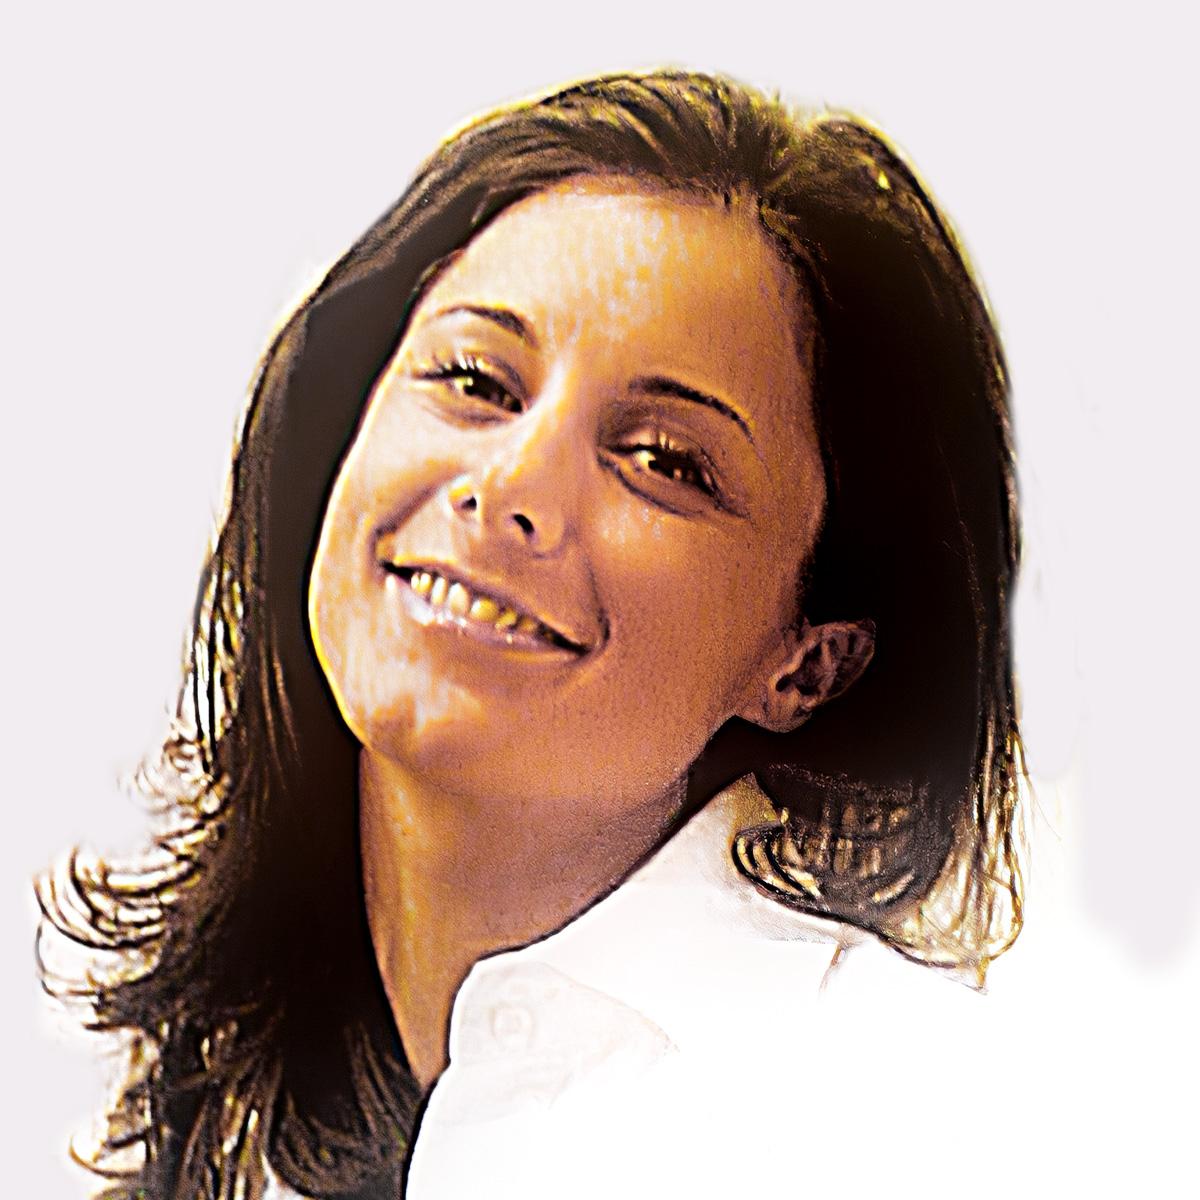 Cristina Monticelli